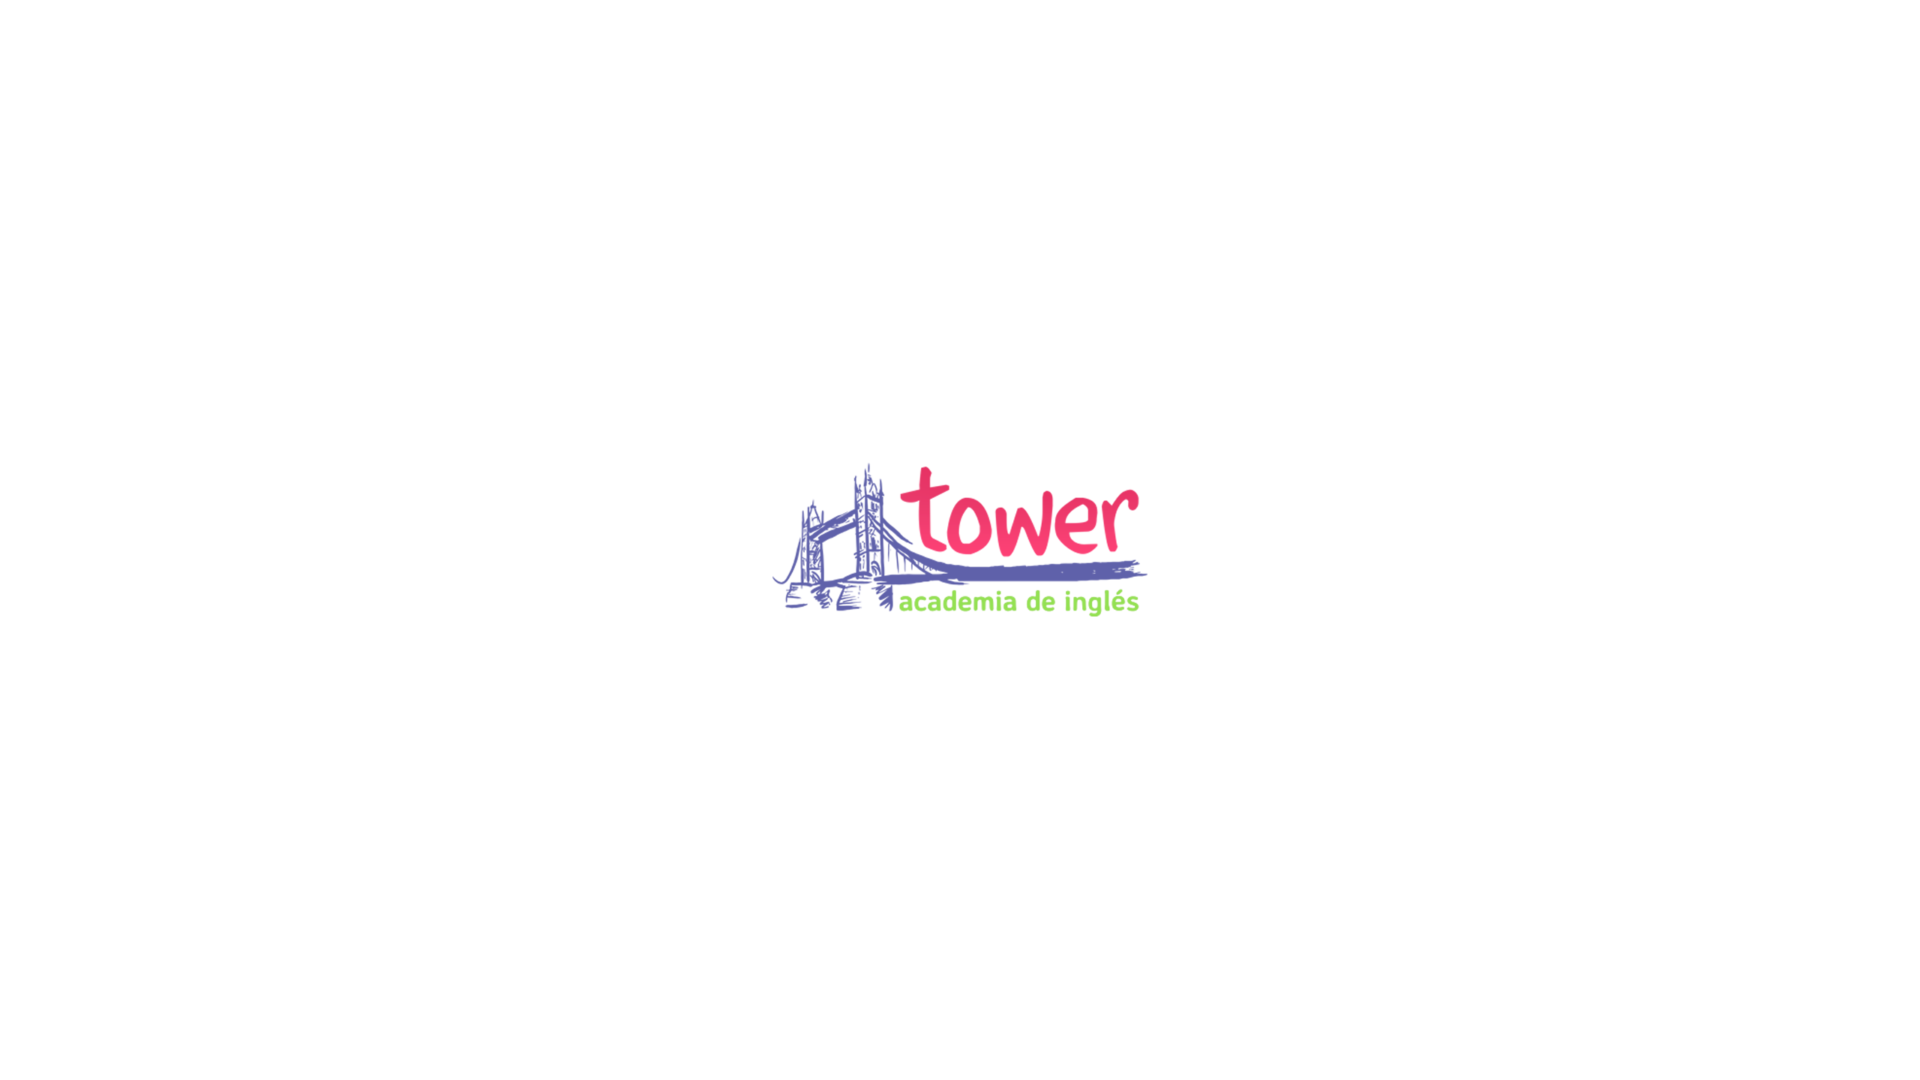 Logotipo Academia de inglés Tower Écija